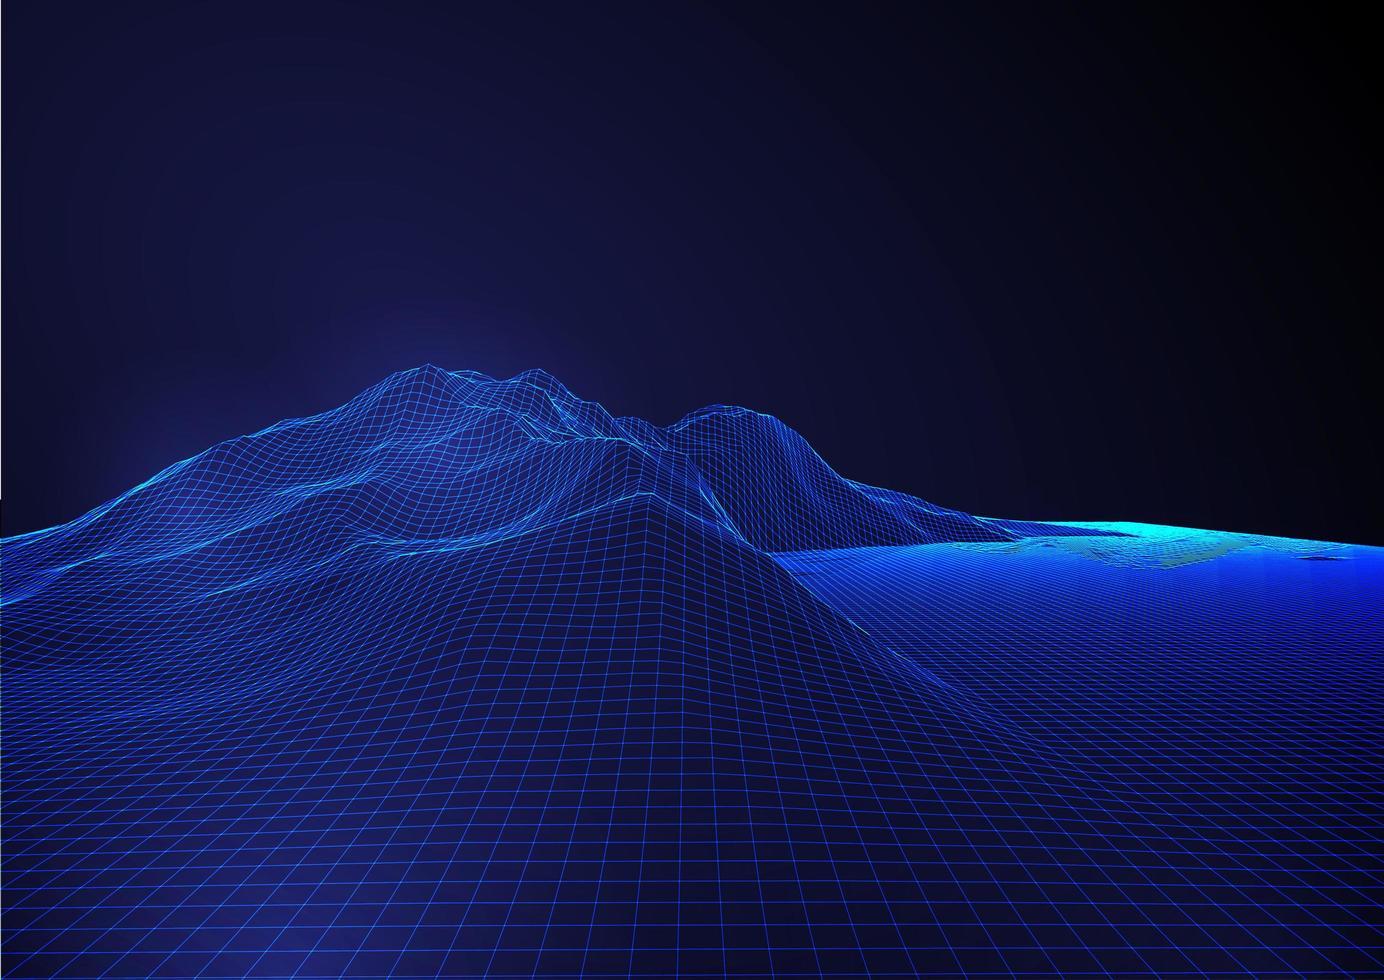 abstracte futuristische blauwe draadframe achtergrond vector